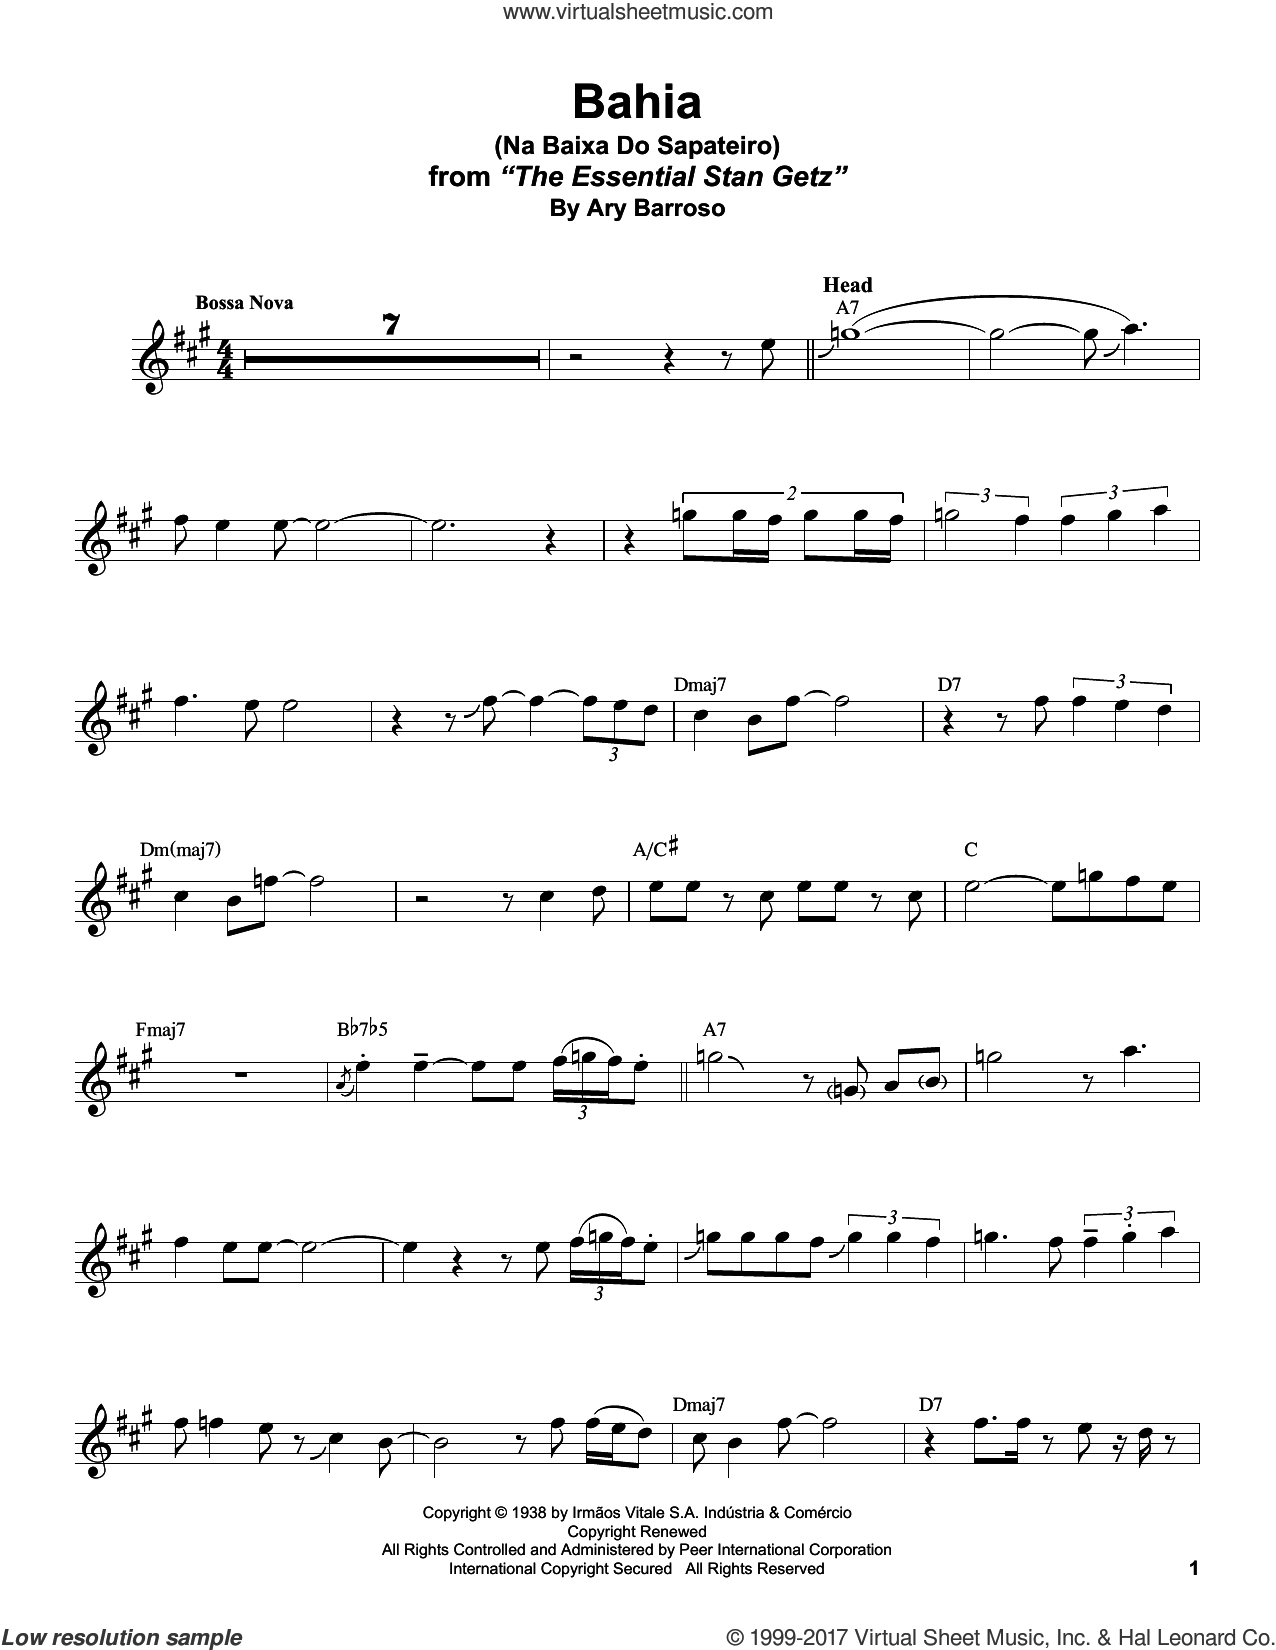 Bahia (Na Baixa Do Sapateiro) sheet music for tenor saxophone solo (transcription) by Stan Getz, Charlie Byrd and Ary Barroso, intermediate tenor saxophone (transcription)